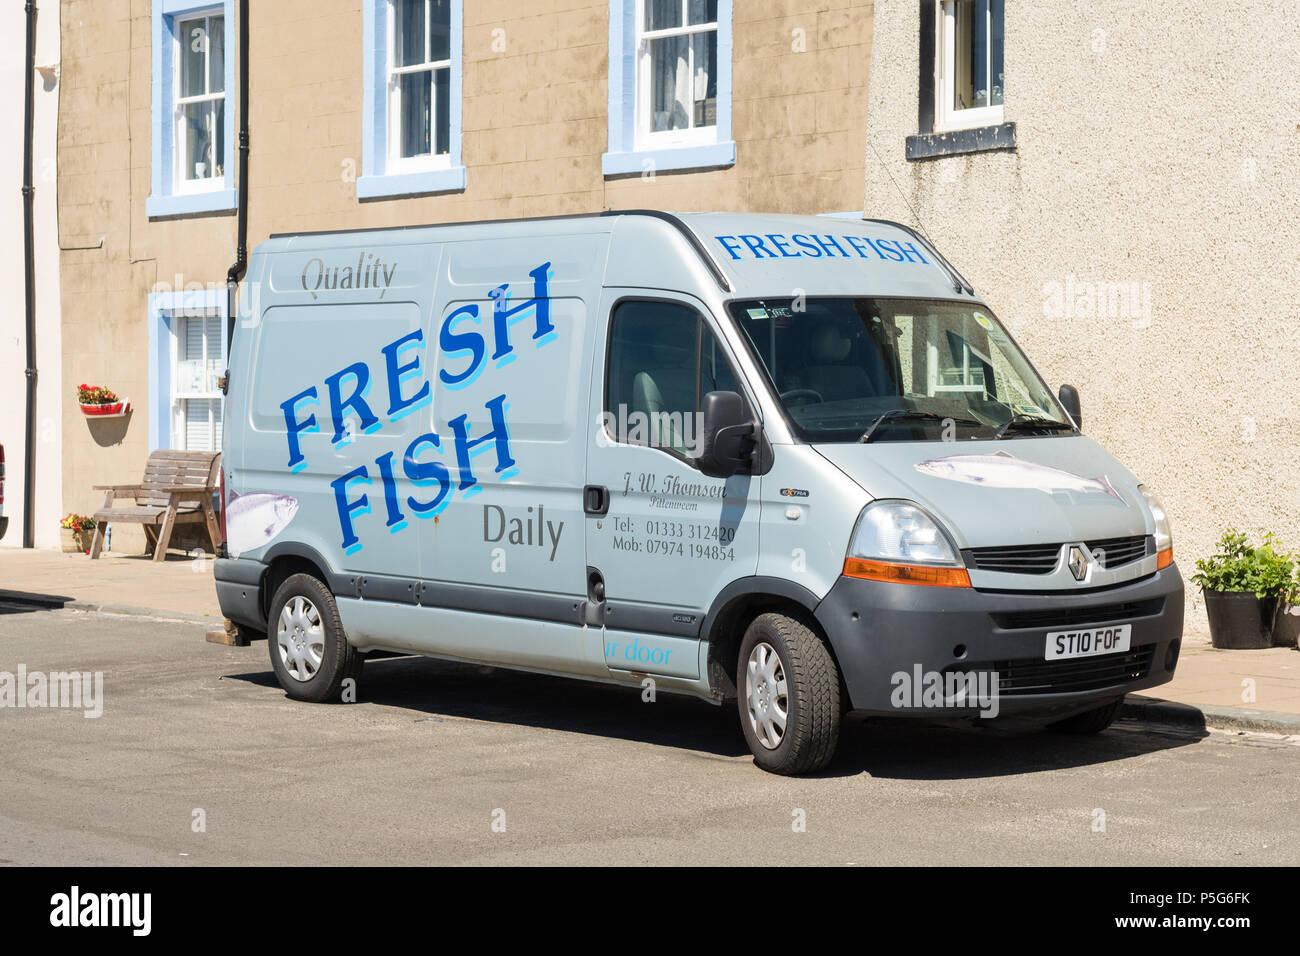 Fresh Fish delivery van in Pittenweem, Fife, Scotland, UK - Stock Image